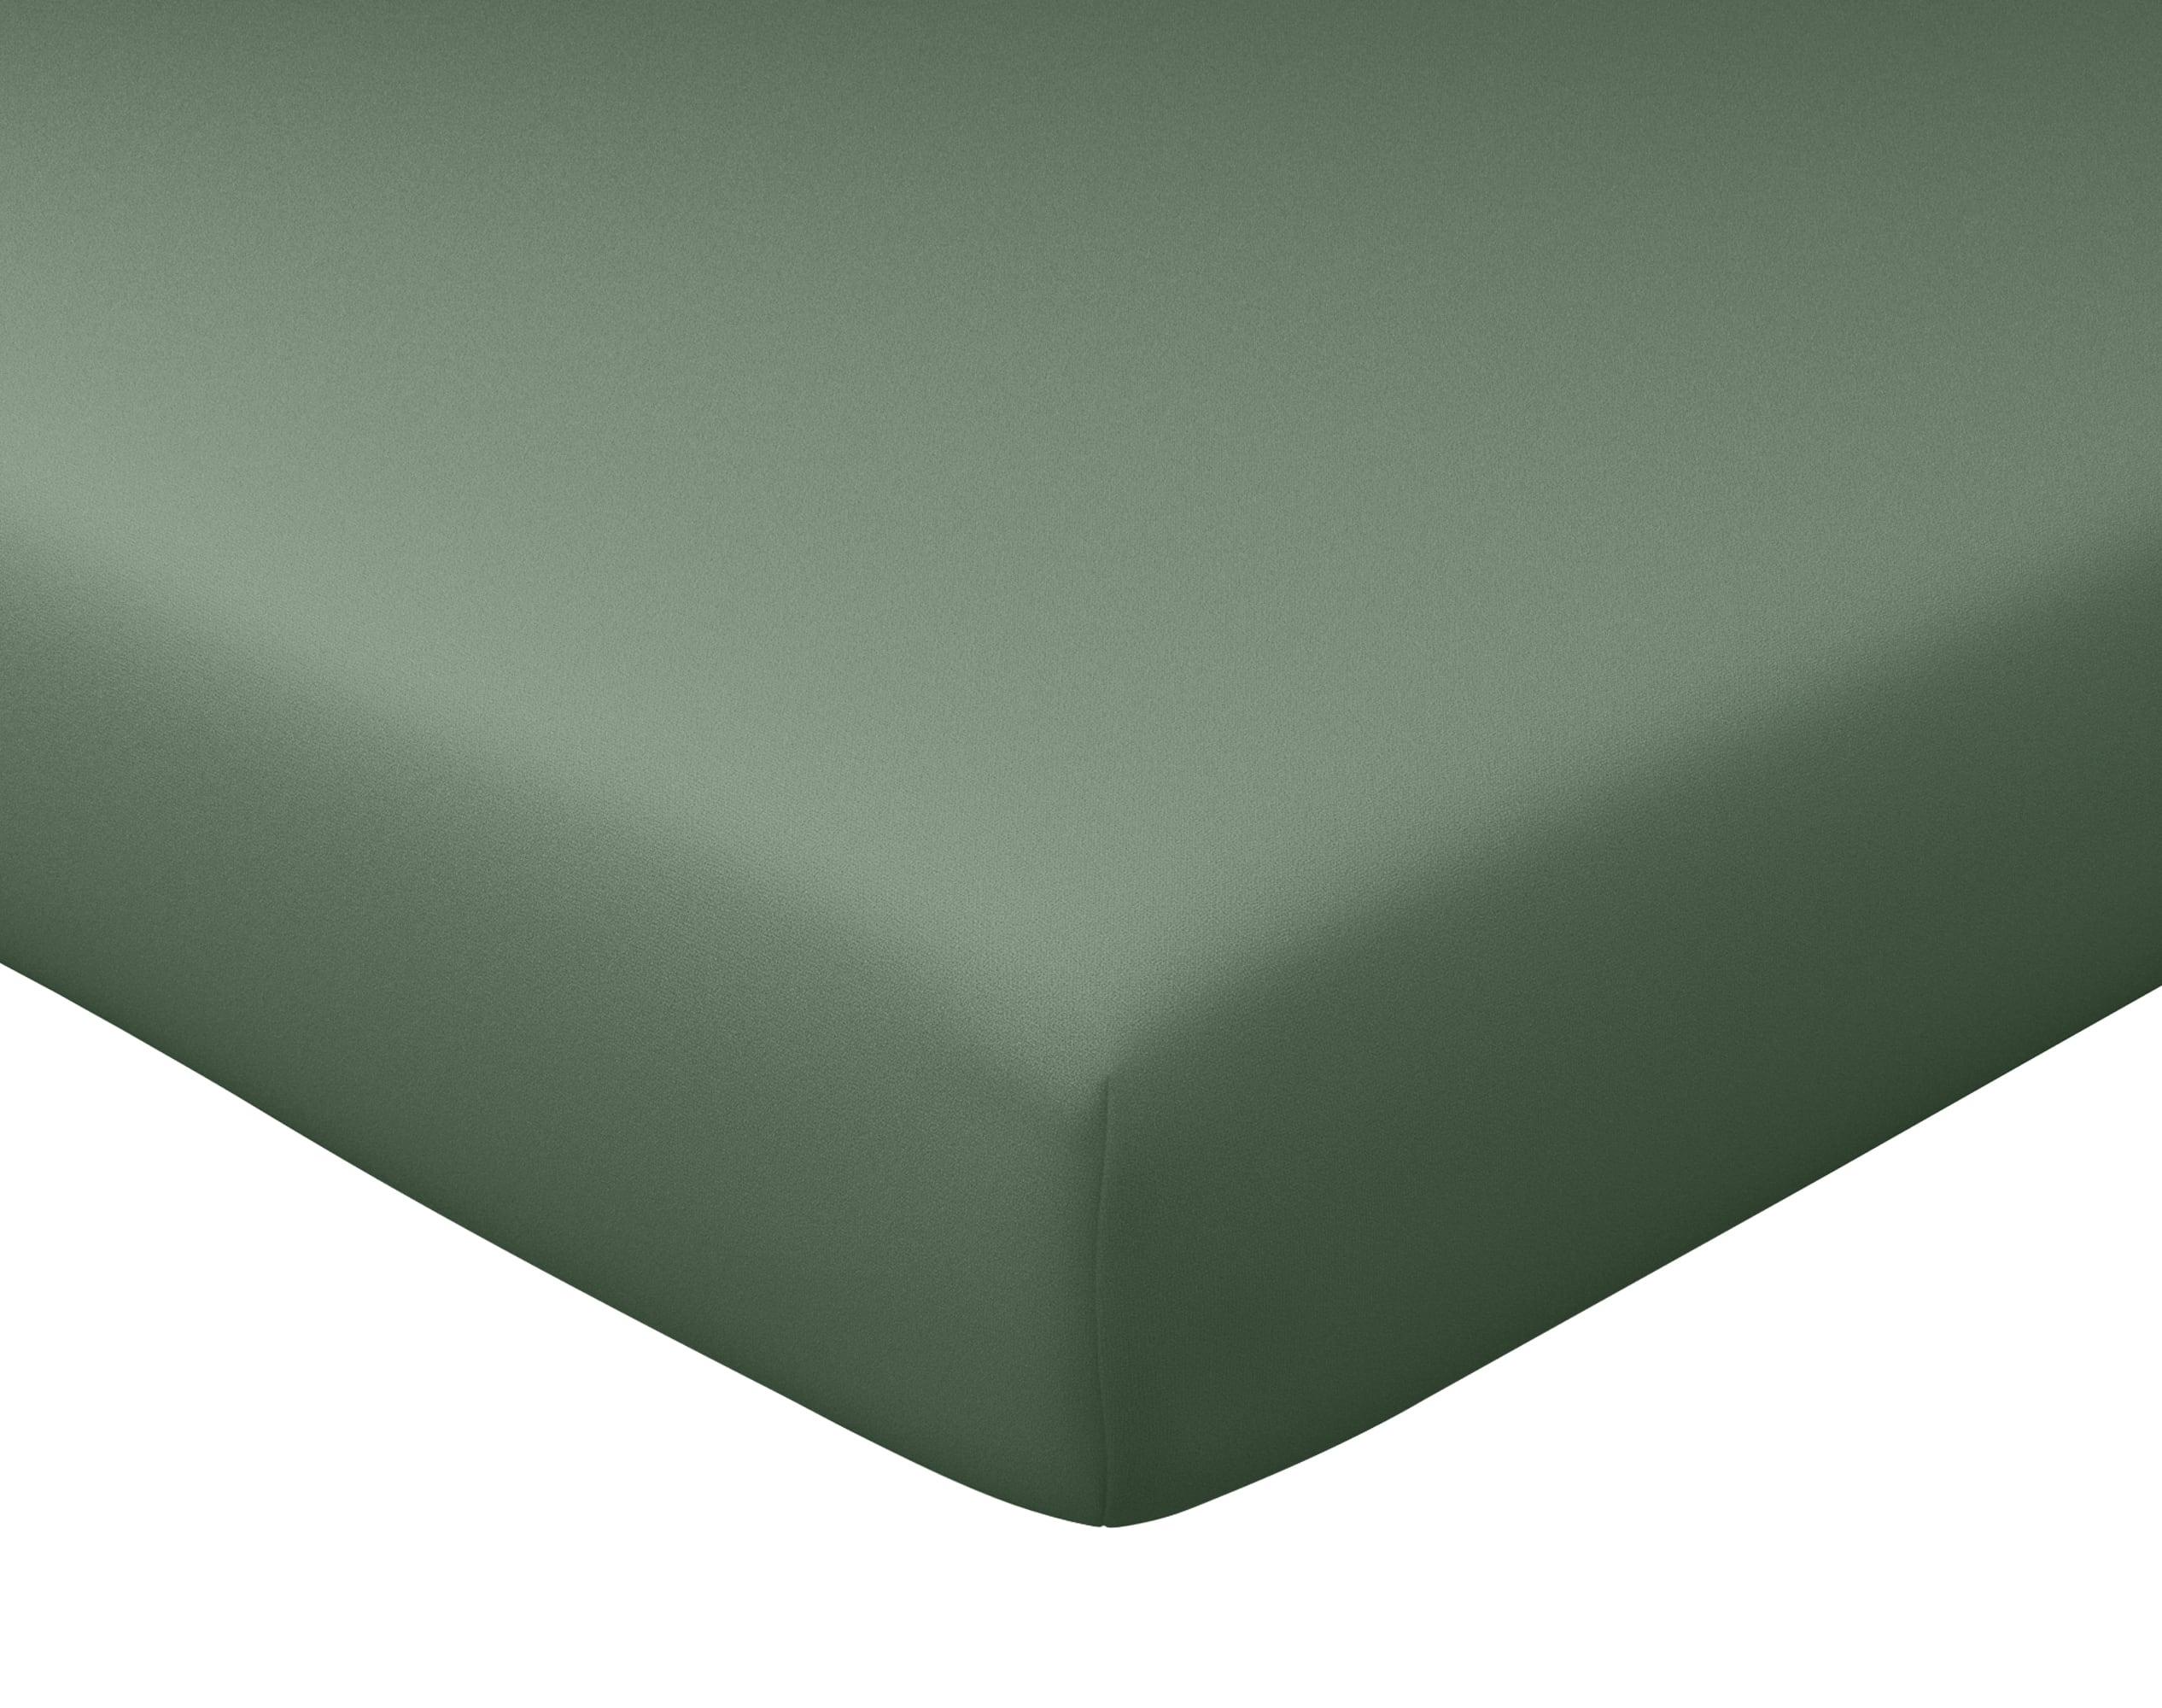 Drap-housse 140x190 en percale de coton  vert kaki